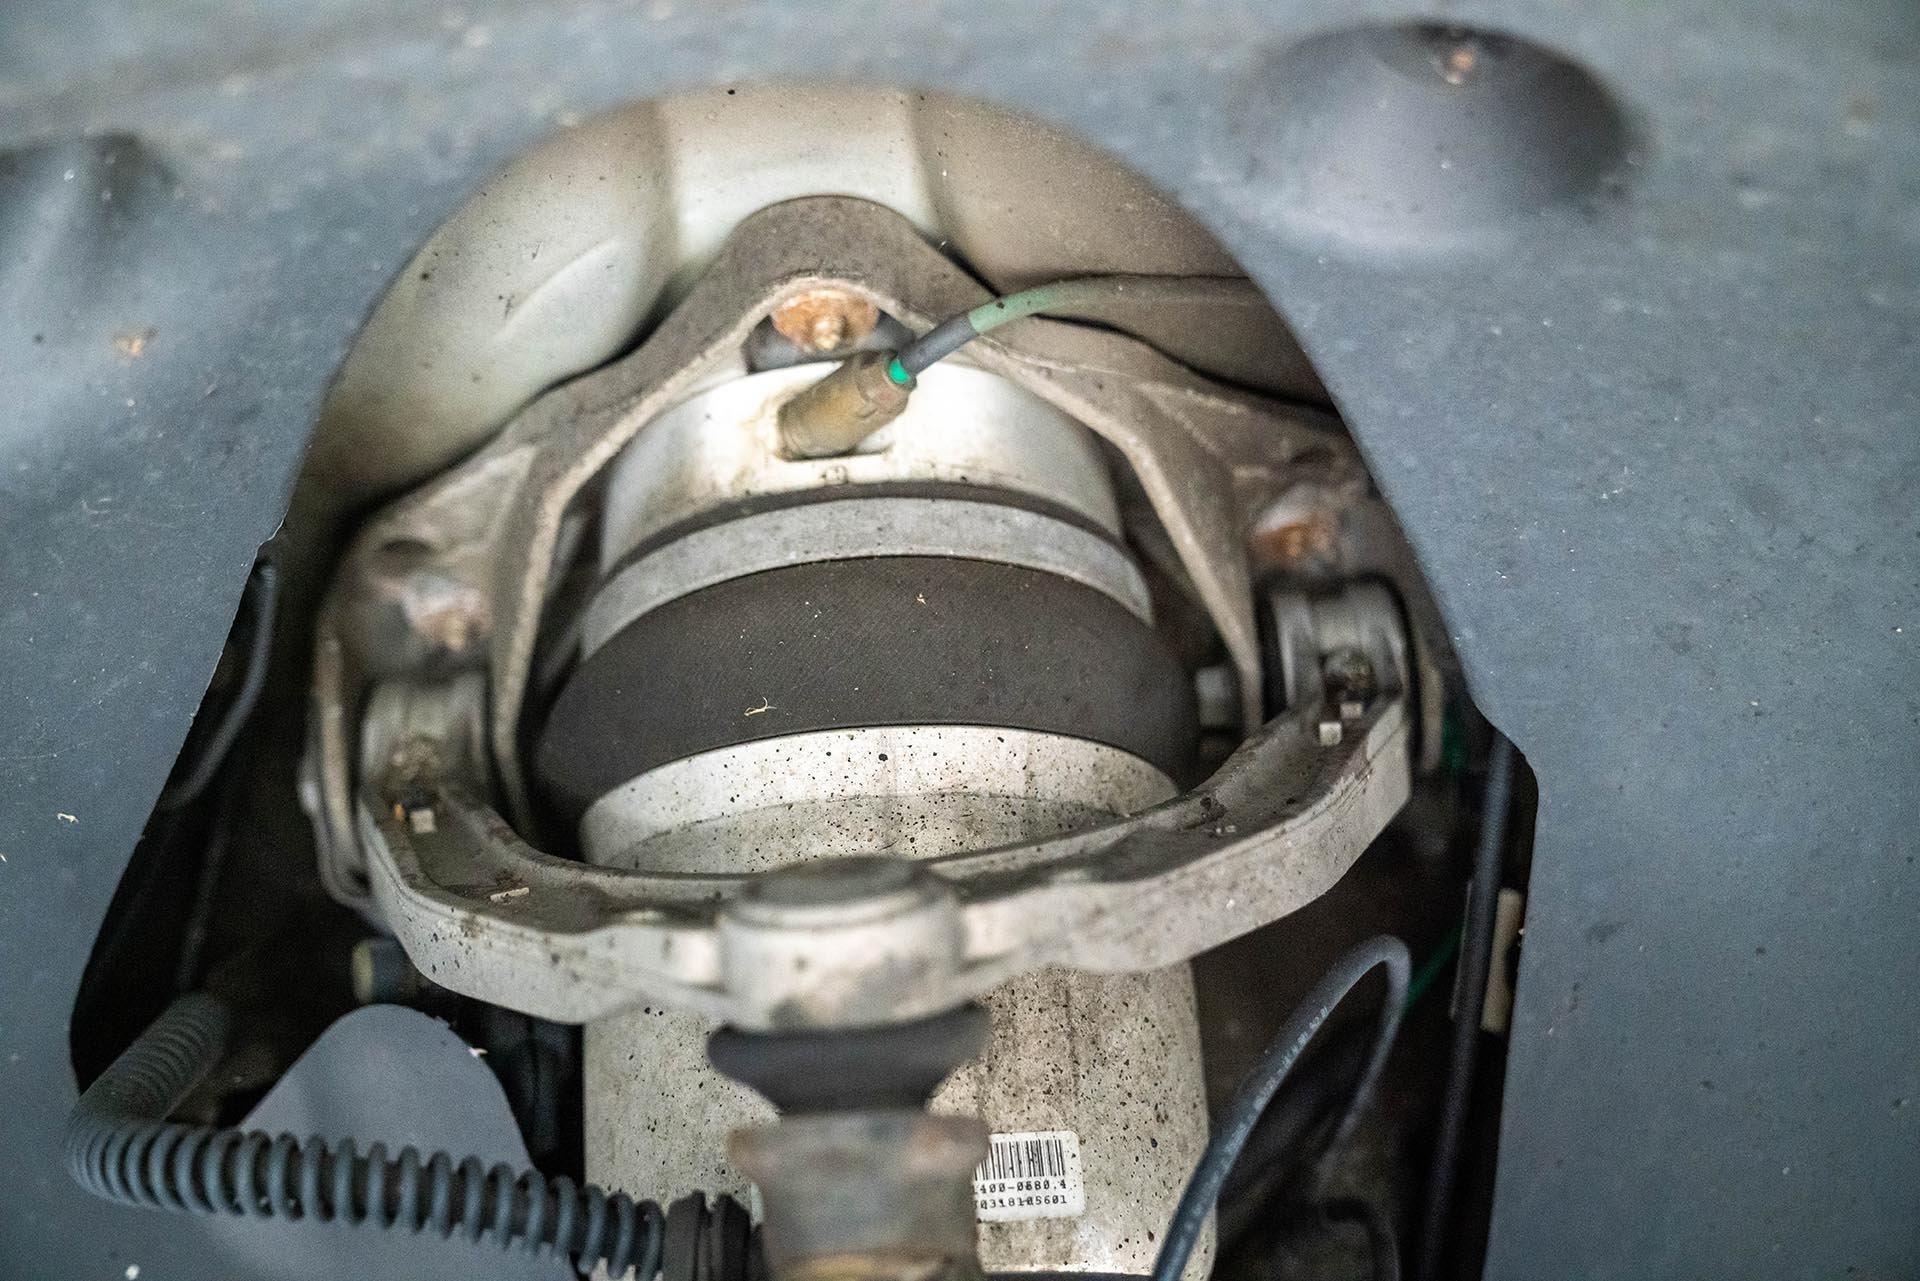 07_Porsche Cayenne 955 957 PASM air suspension connection